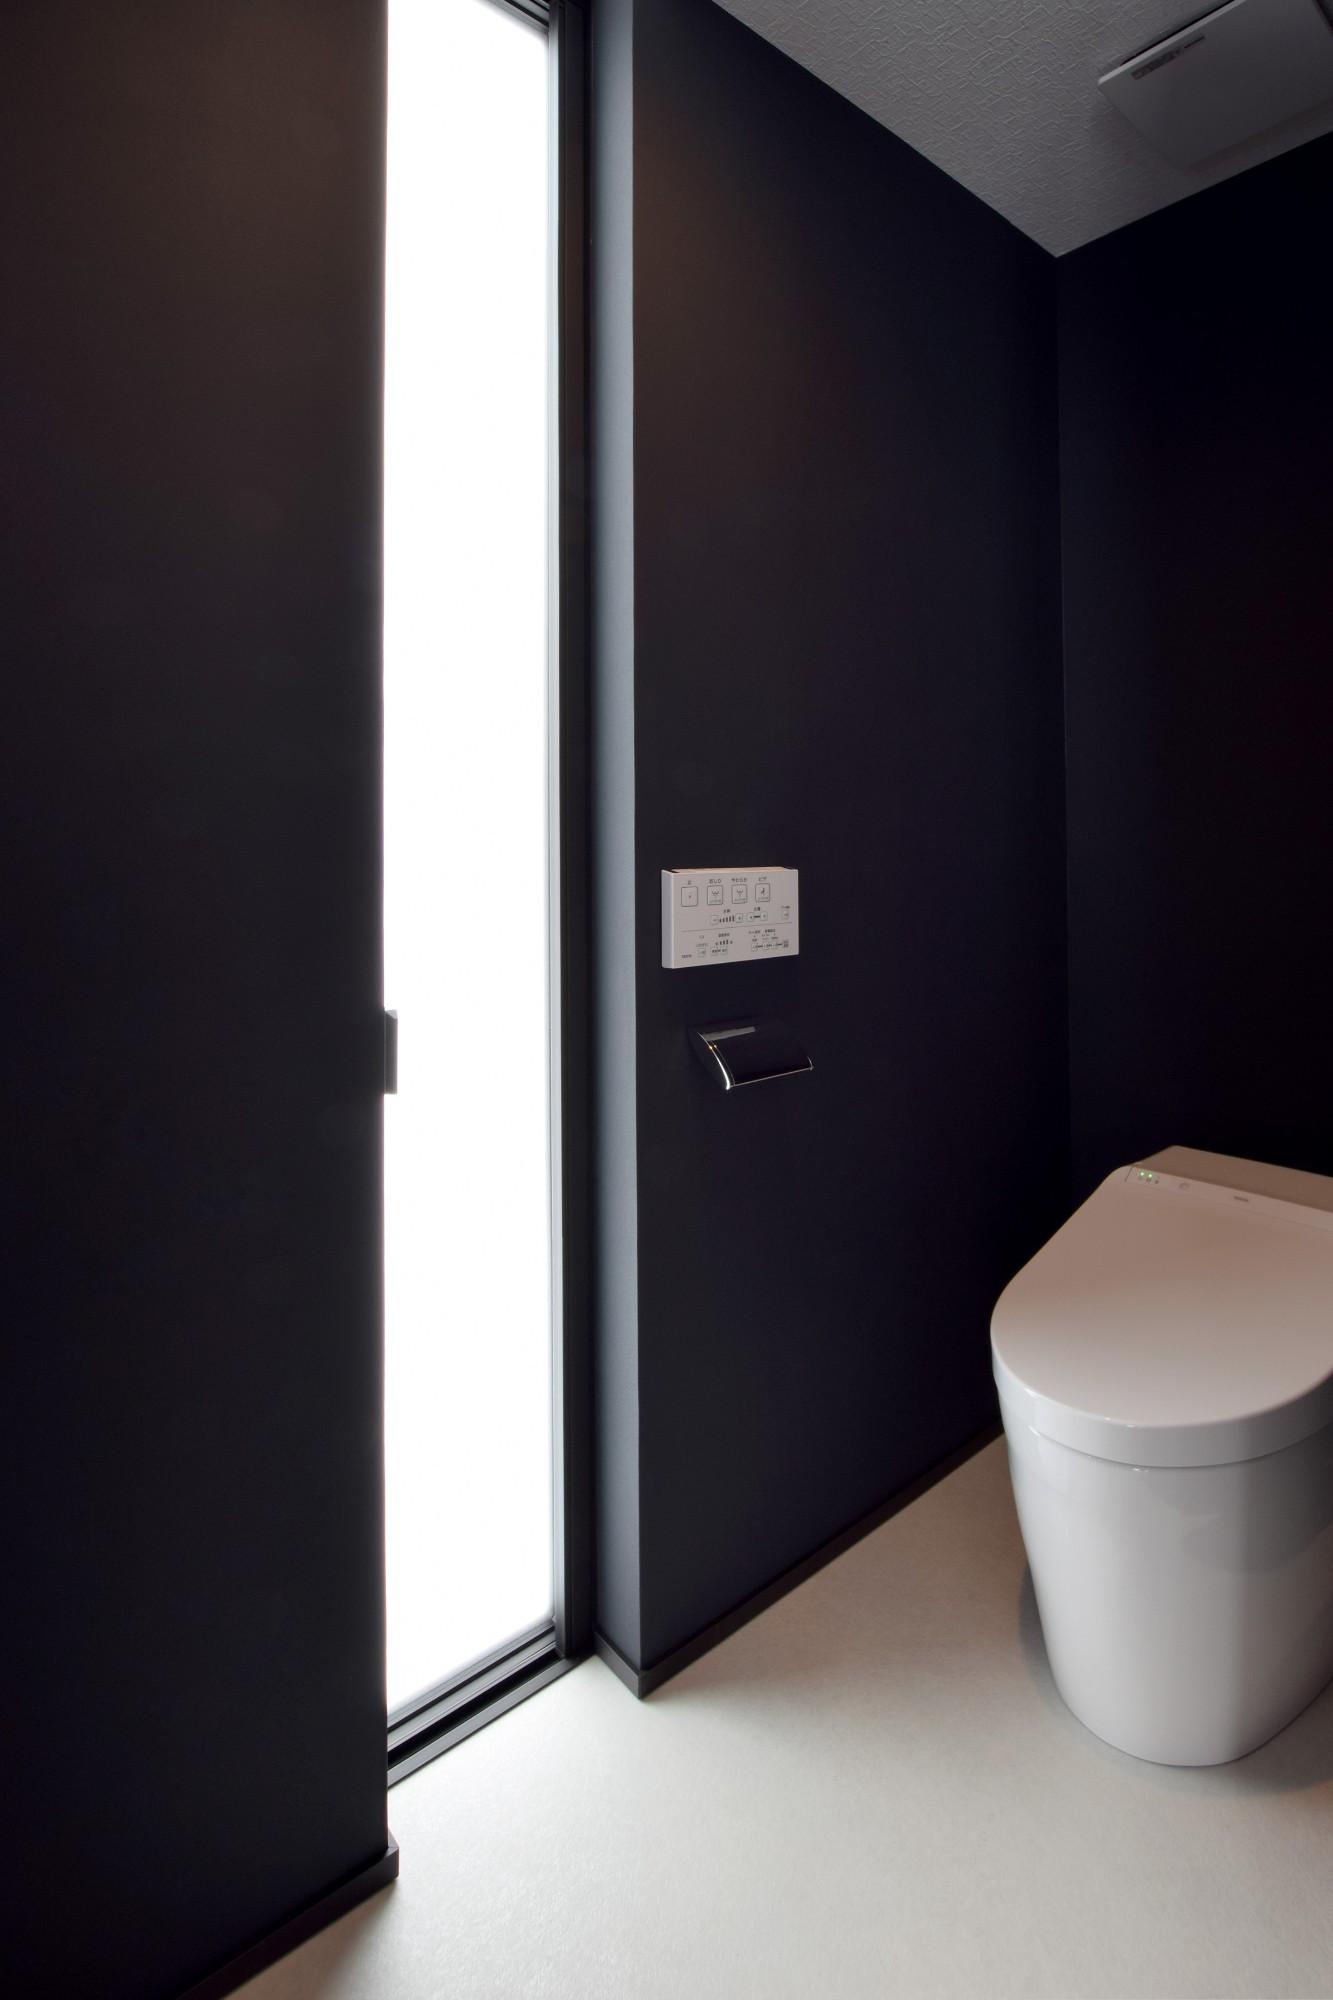 DETAIL HOME(ディテールホーム)「趣味と風景をたのしむ家」のヴィンテージなトイレの実例写真